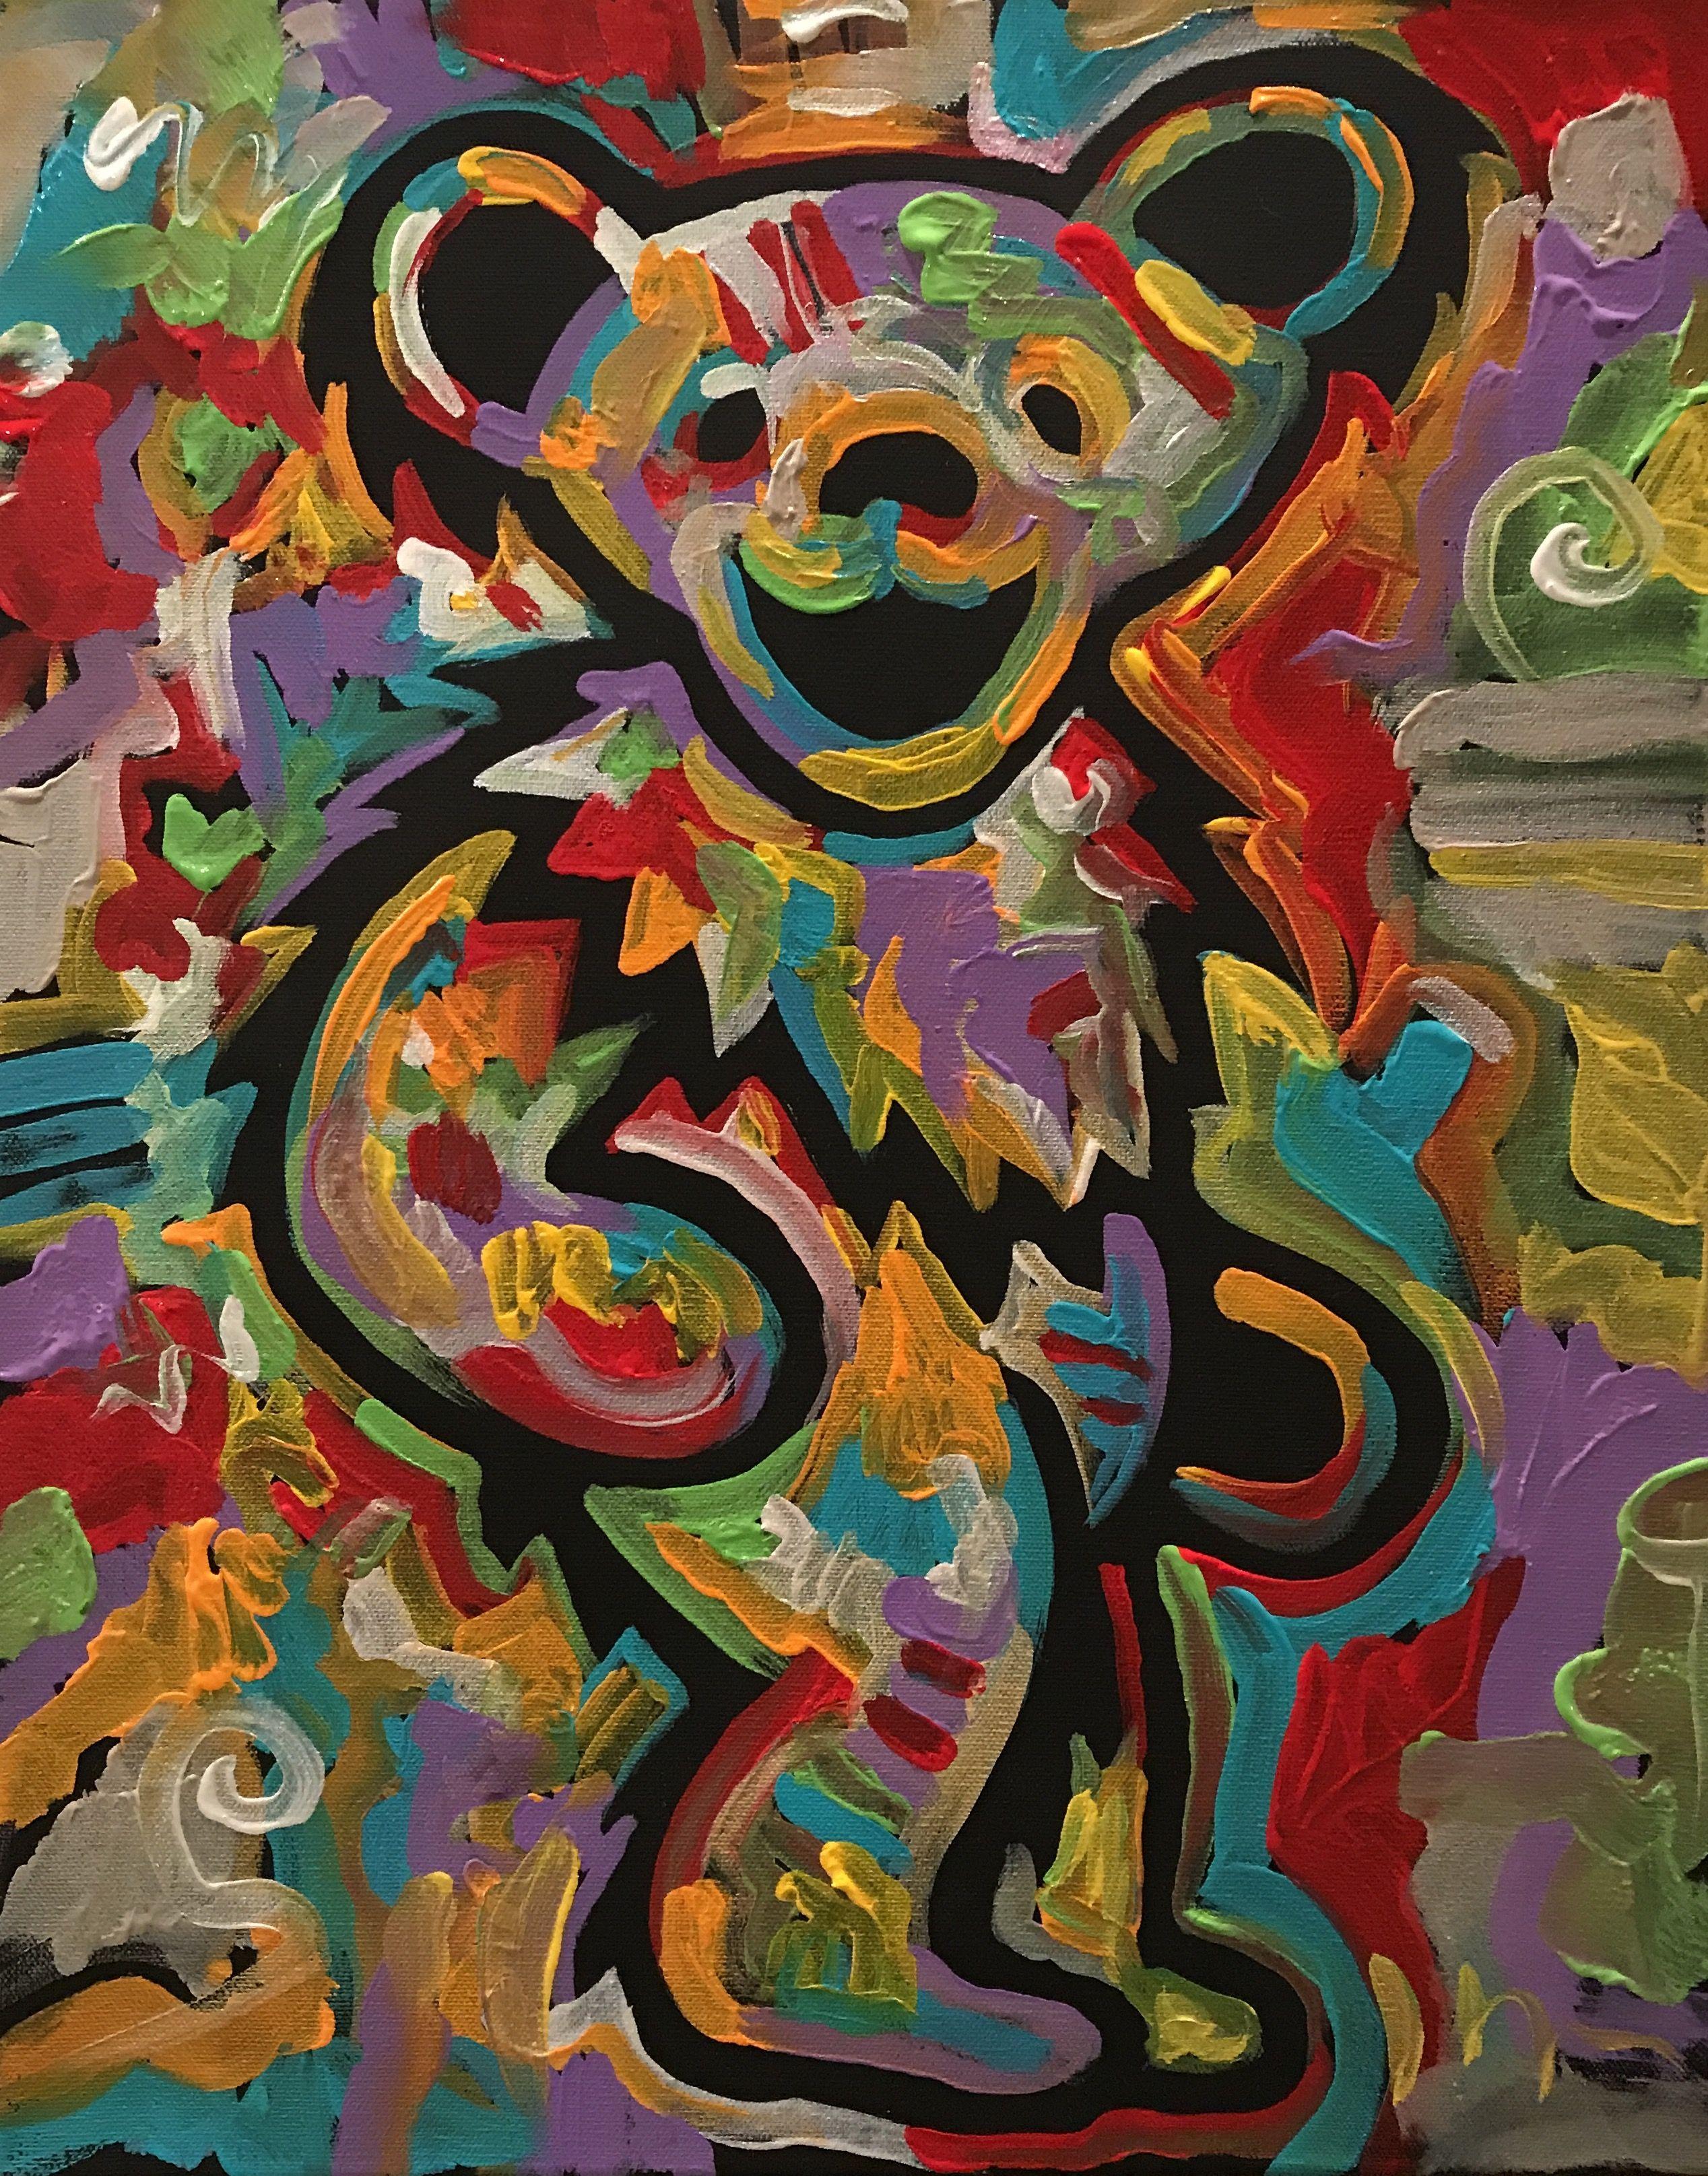 Grateful Dead Bears Iphone Wallpaper 25771 Interiordesign